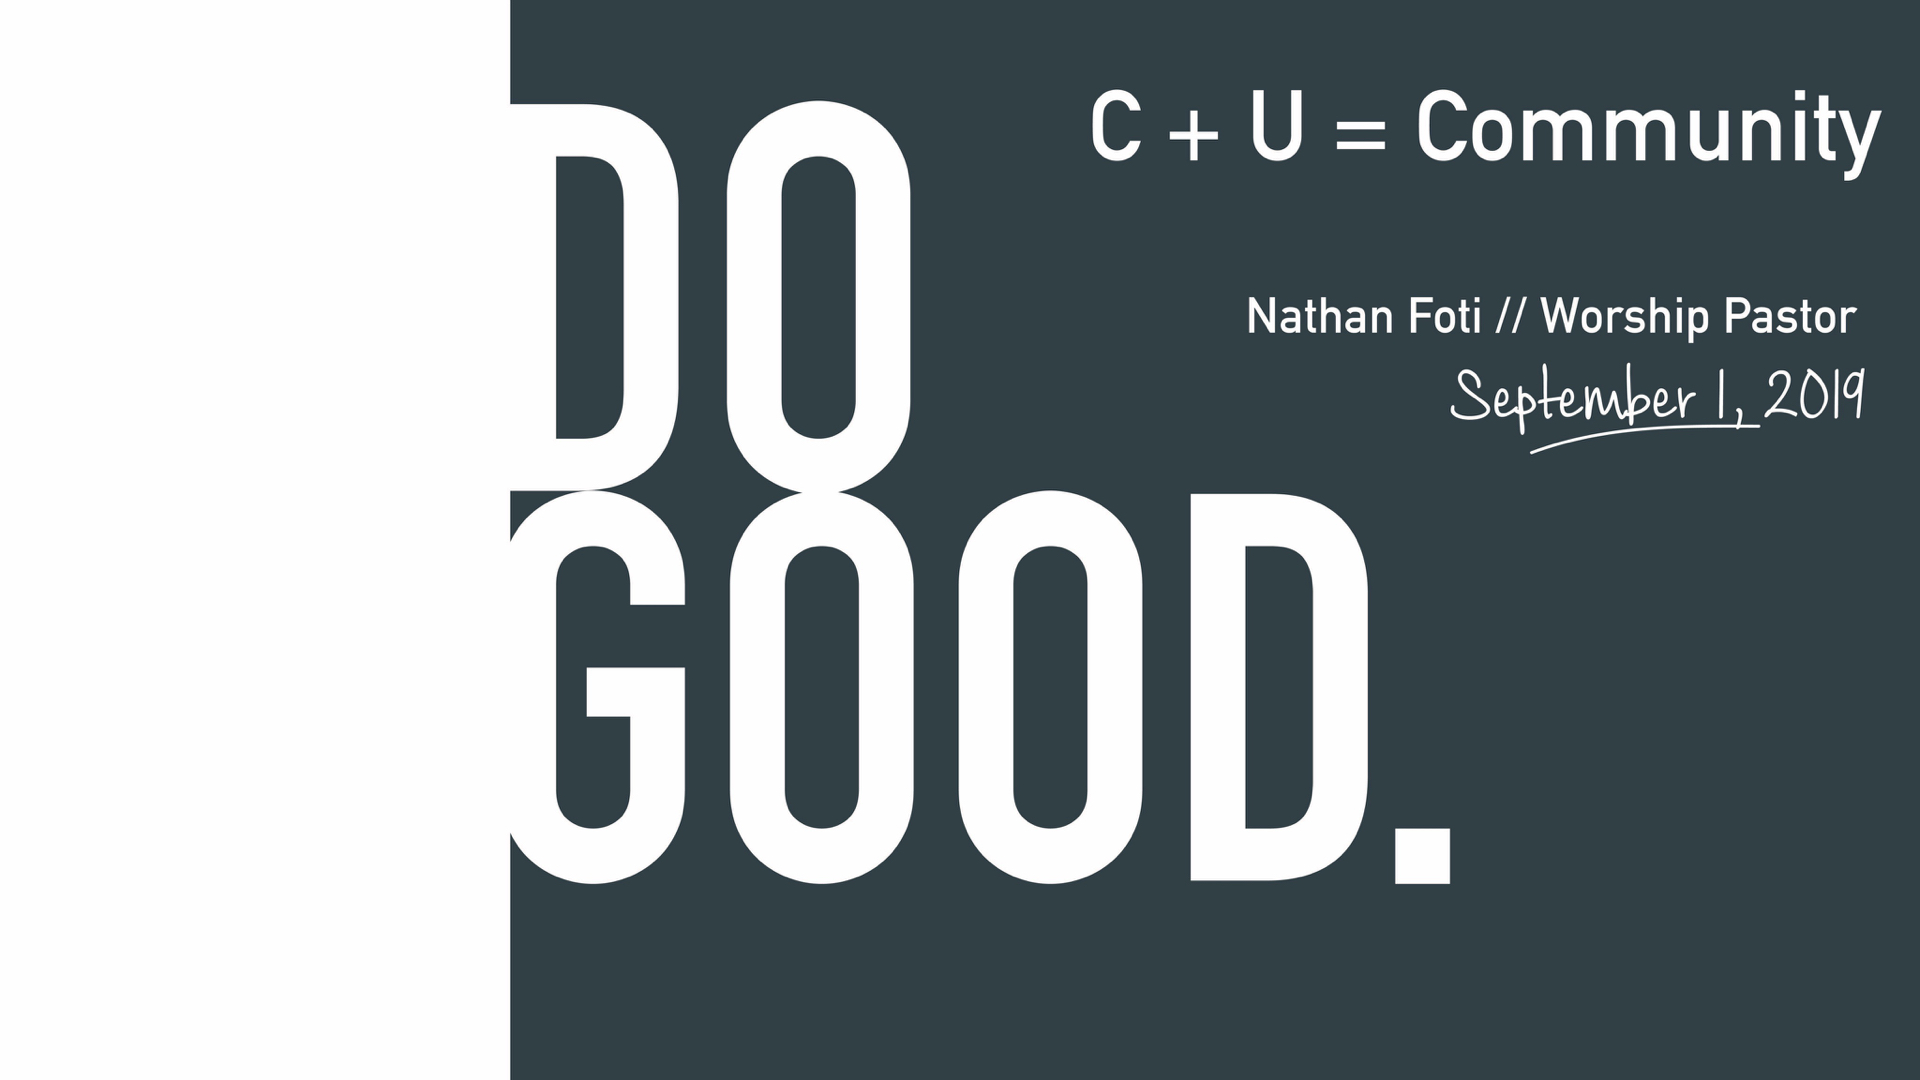 09-01-19 - DG - C + U = Community copy.001.jpeg